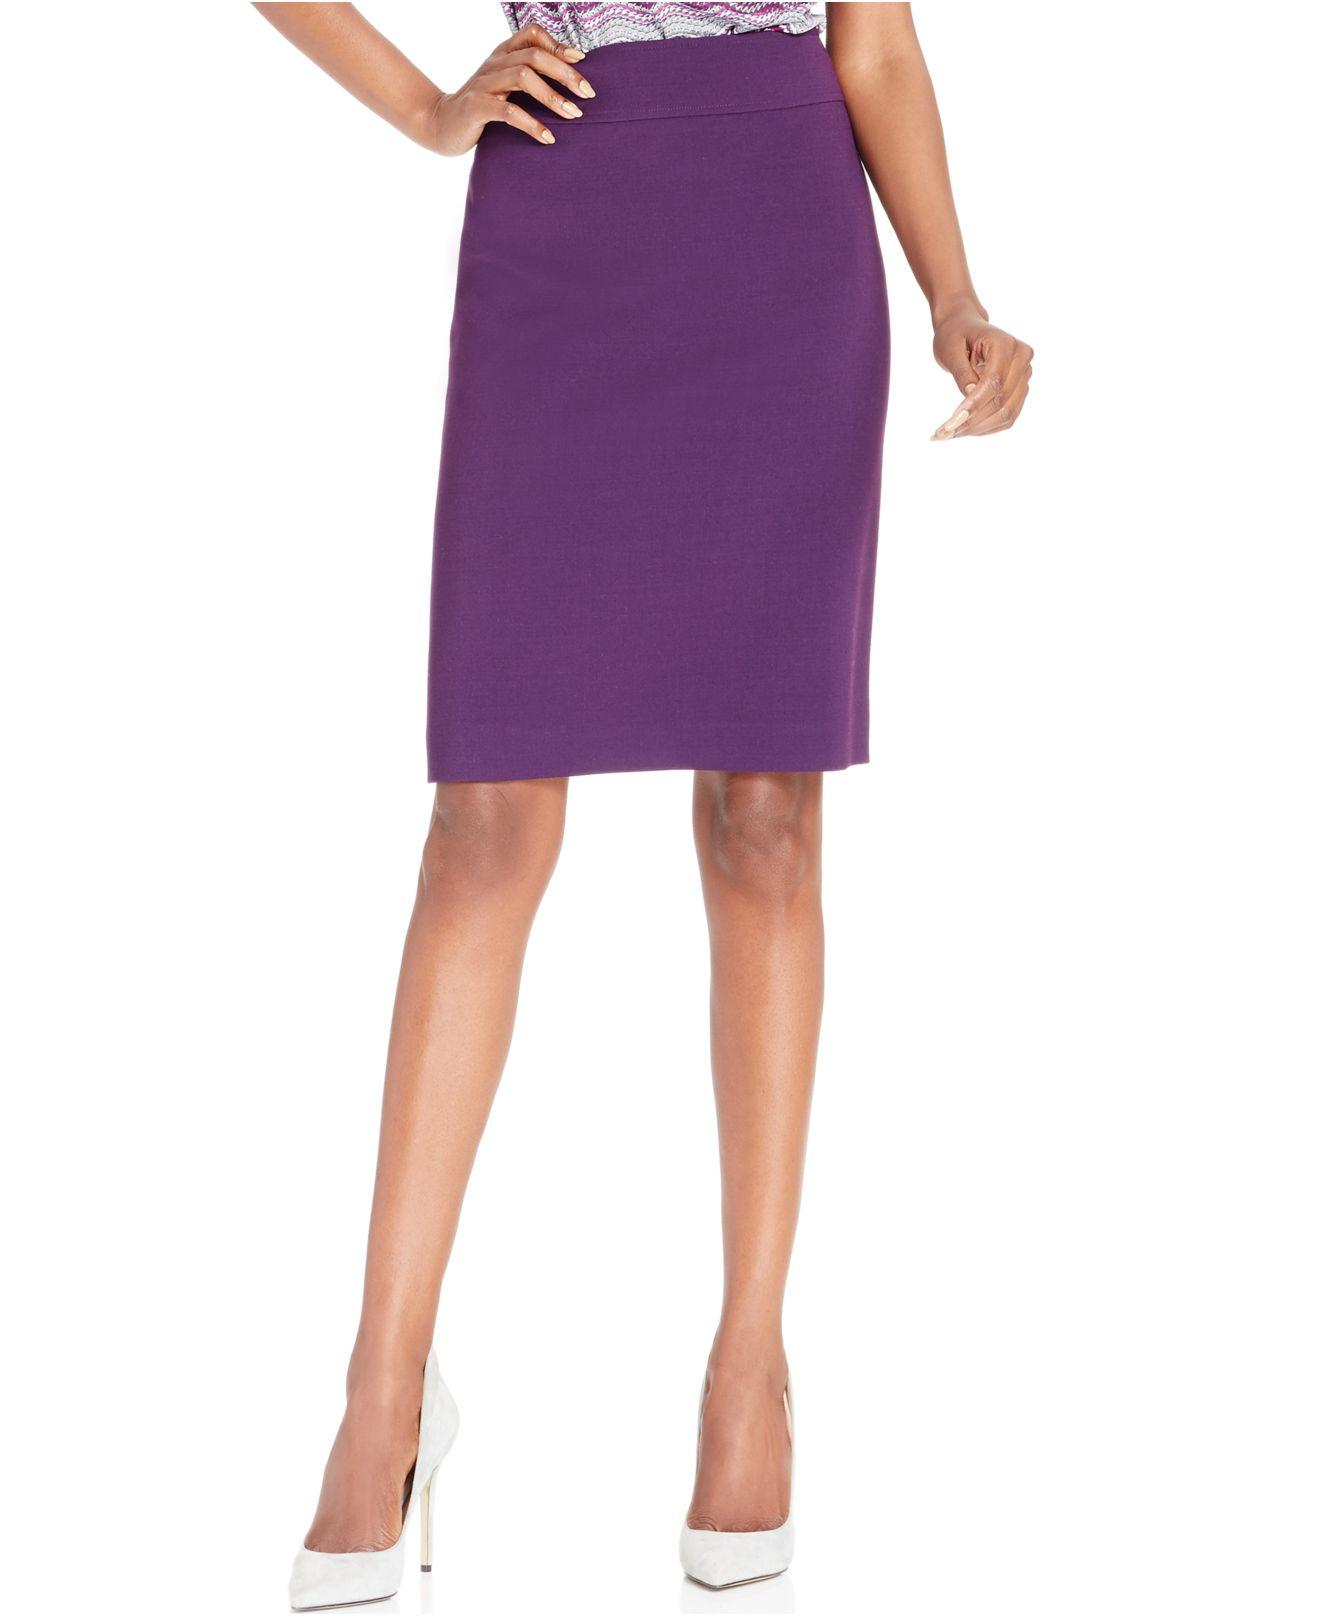 ab97ac3eaa Lyst - Tahari Ponte Pencil Skirt in Purple